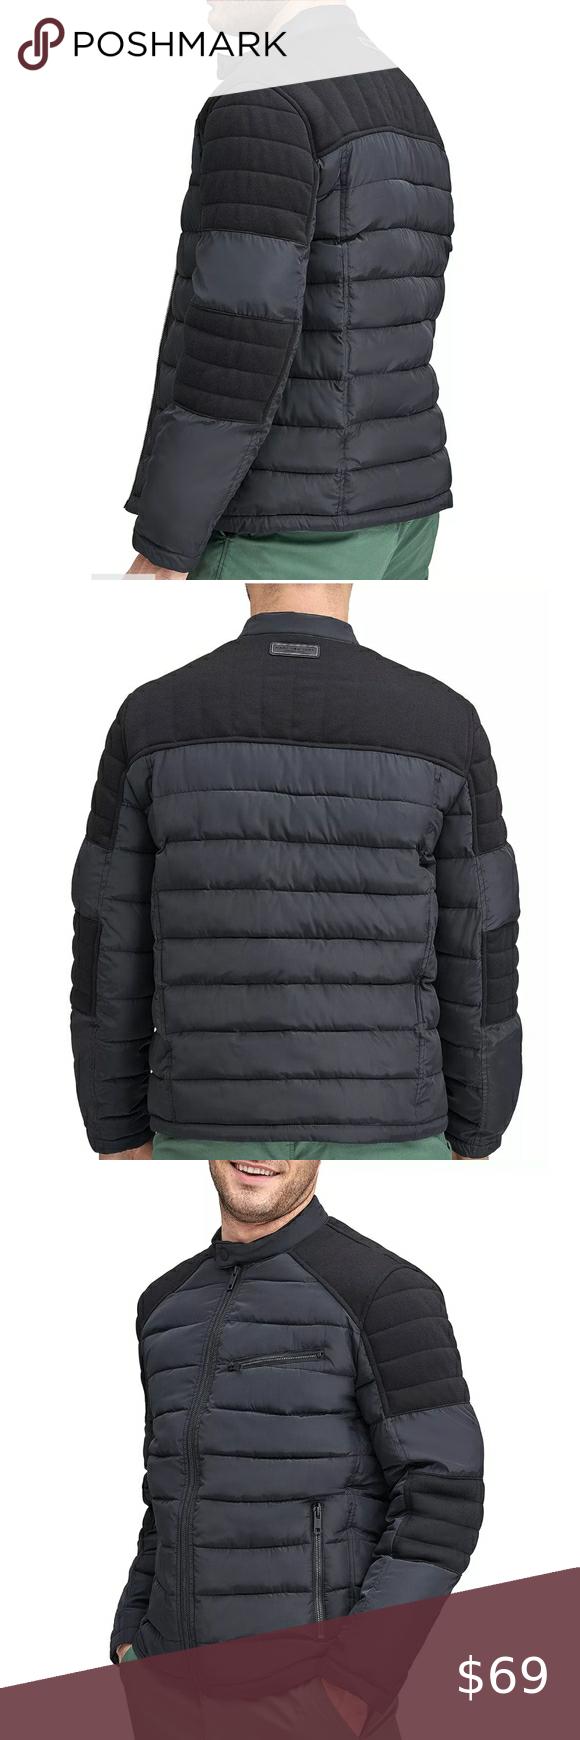 Andrew Mark Marc New York Puffer Jacket Marc New York Puffer Jackets Jackets [ 1740 x 580 Pixel ]